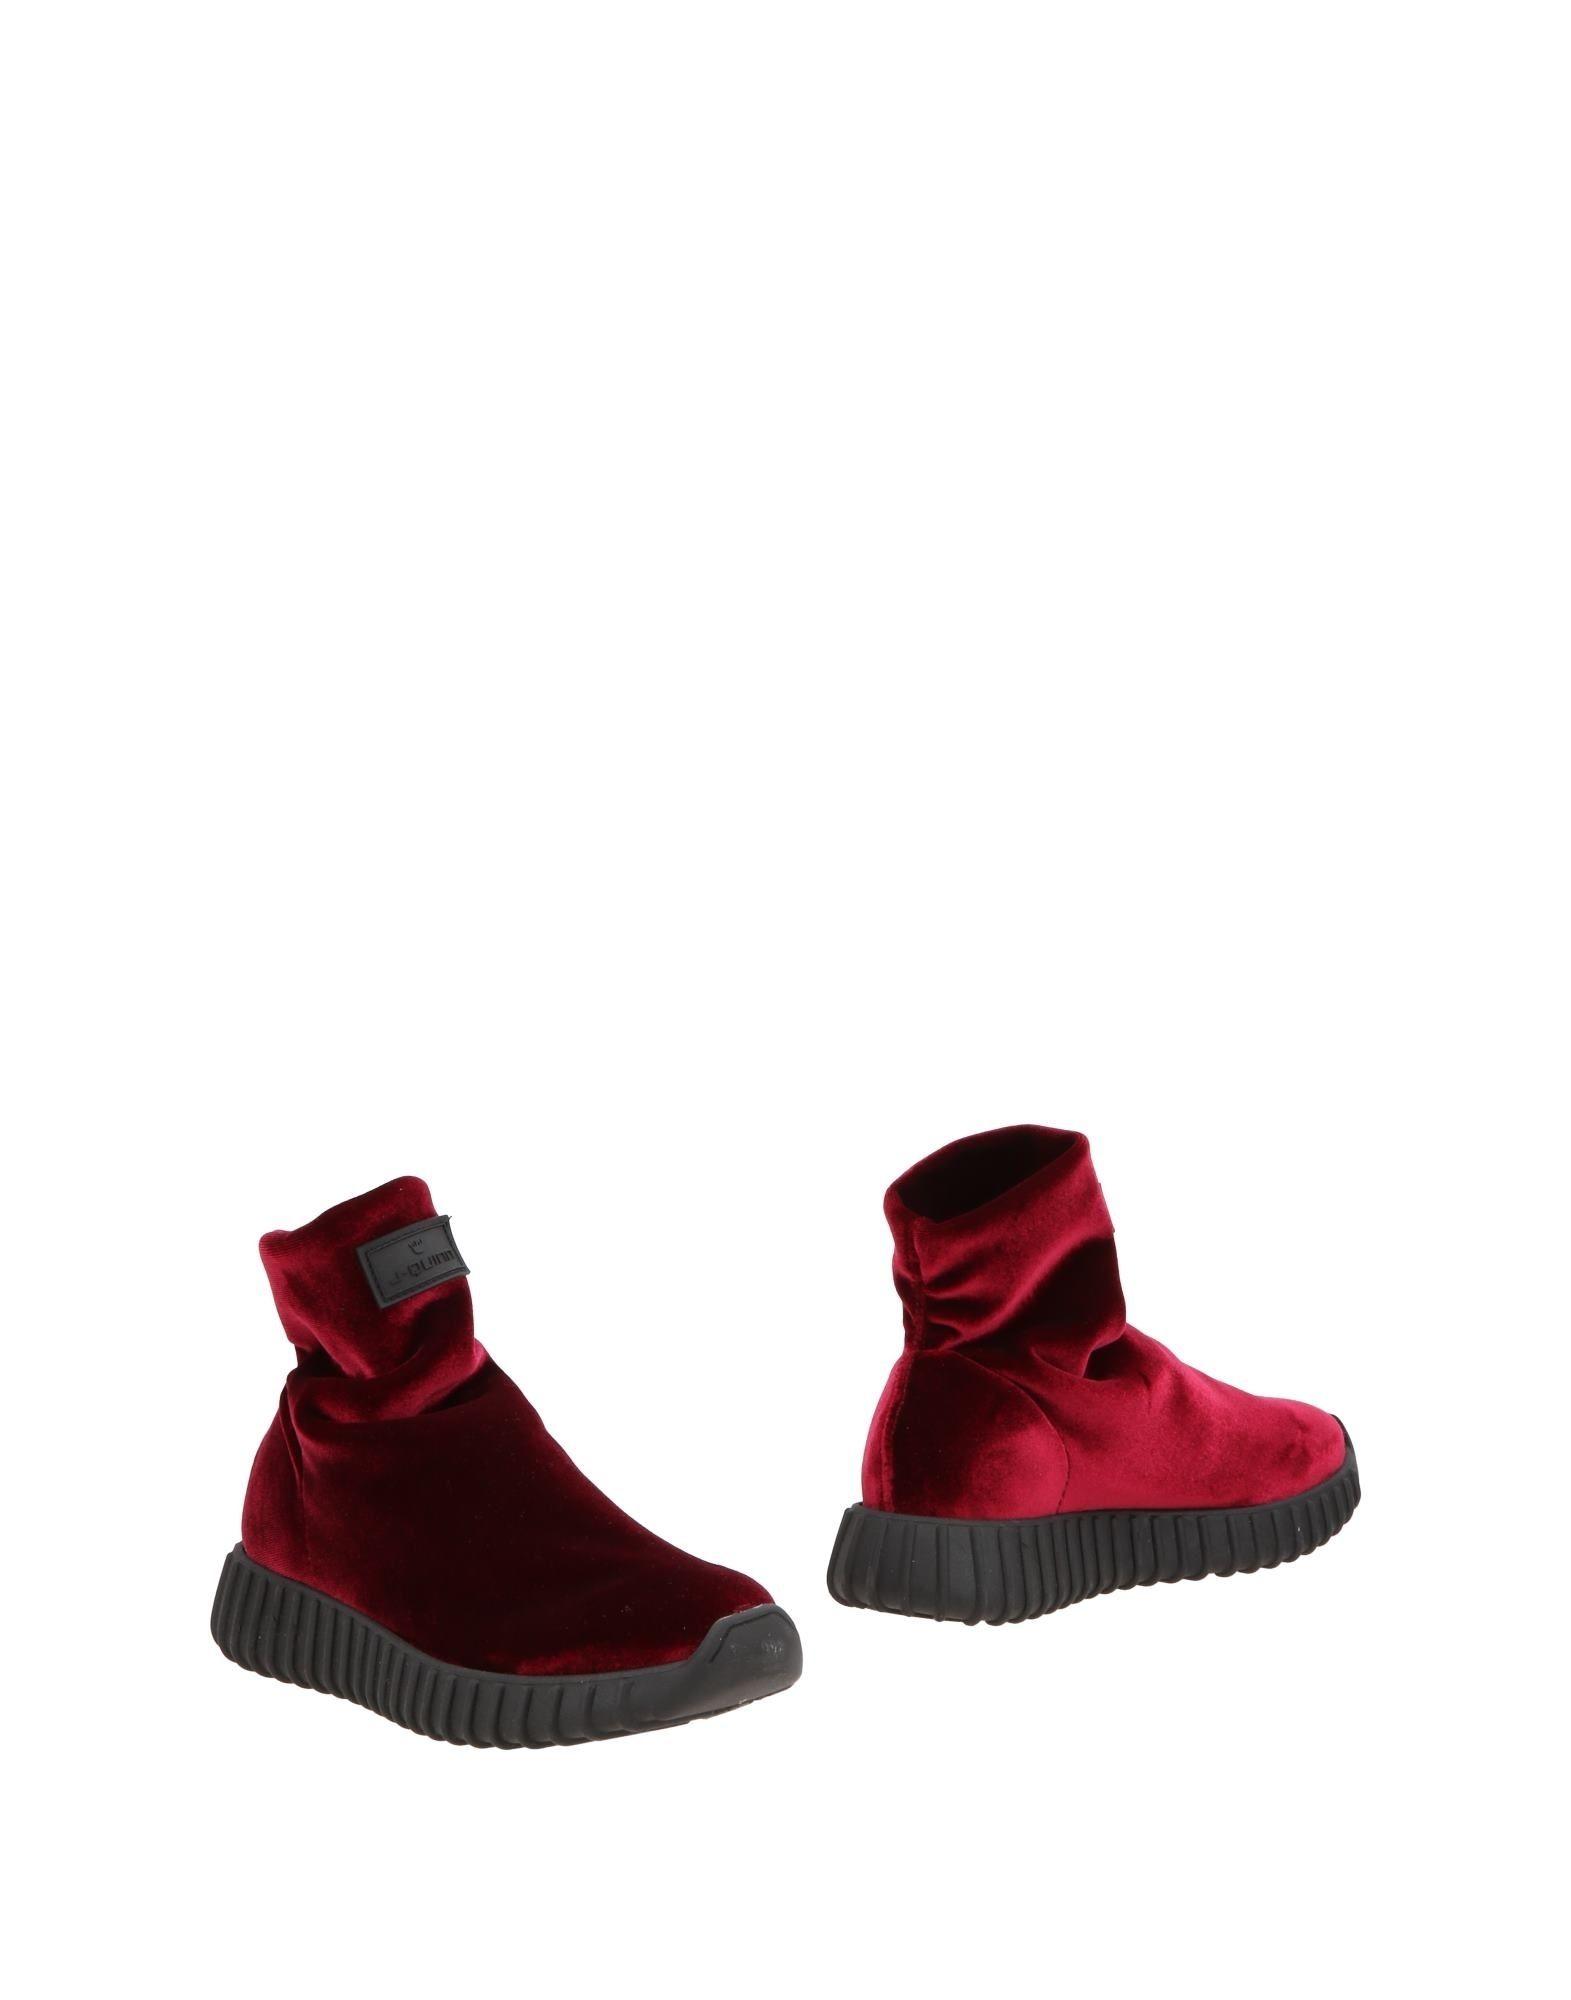 J 11500748KR Gute Qualität beliebte Schuhe